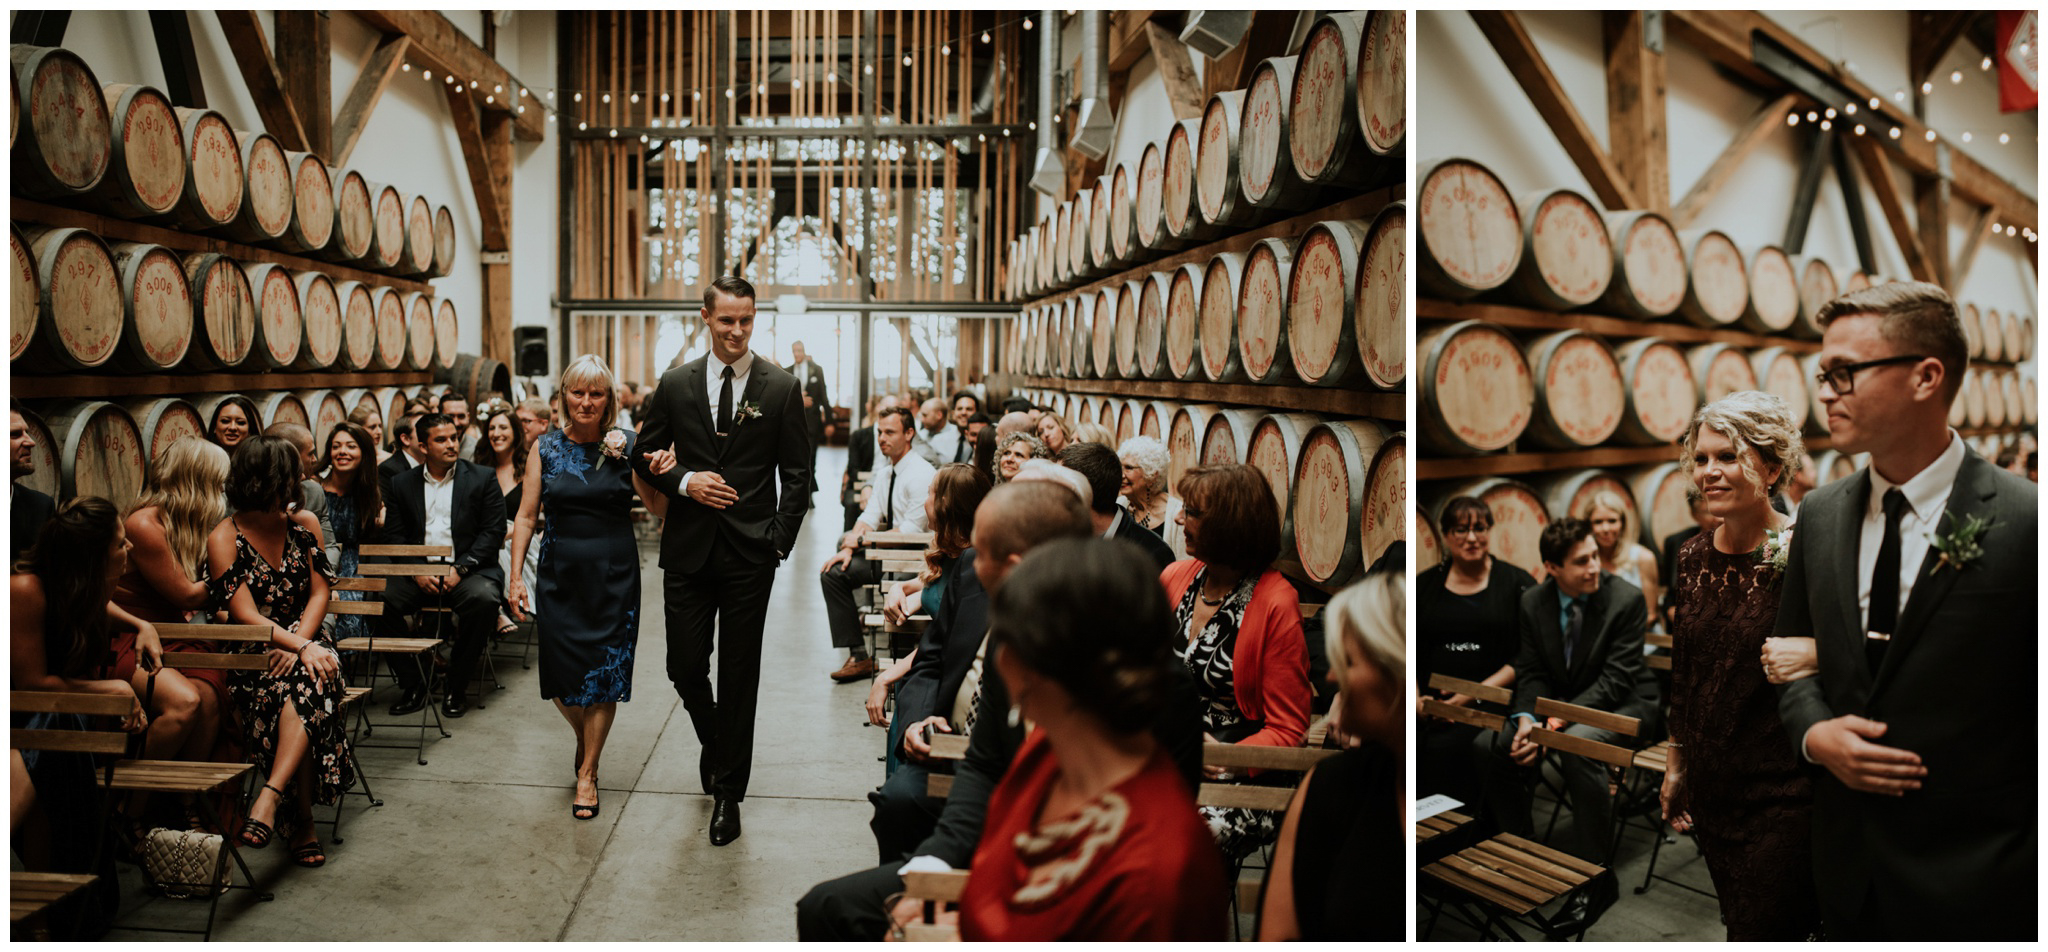 alyssa-keiran-westland-distillery-urban-seattle-wedding-photographer-caitlyn-nikula-105.jpg